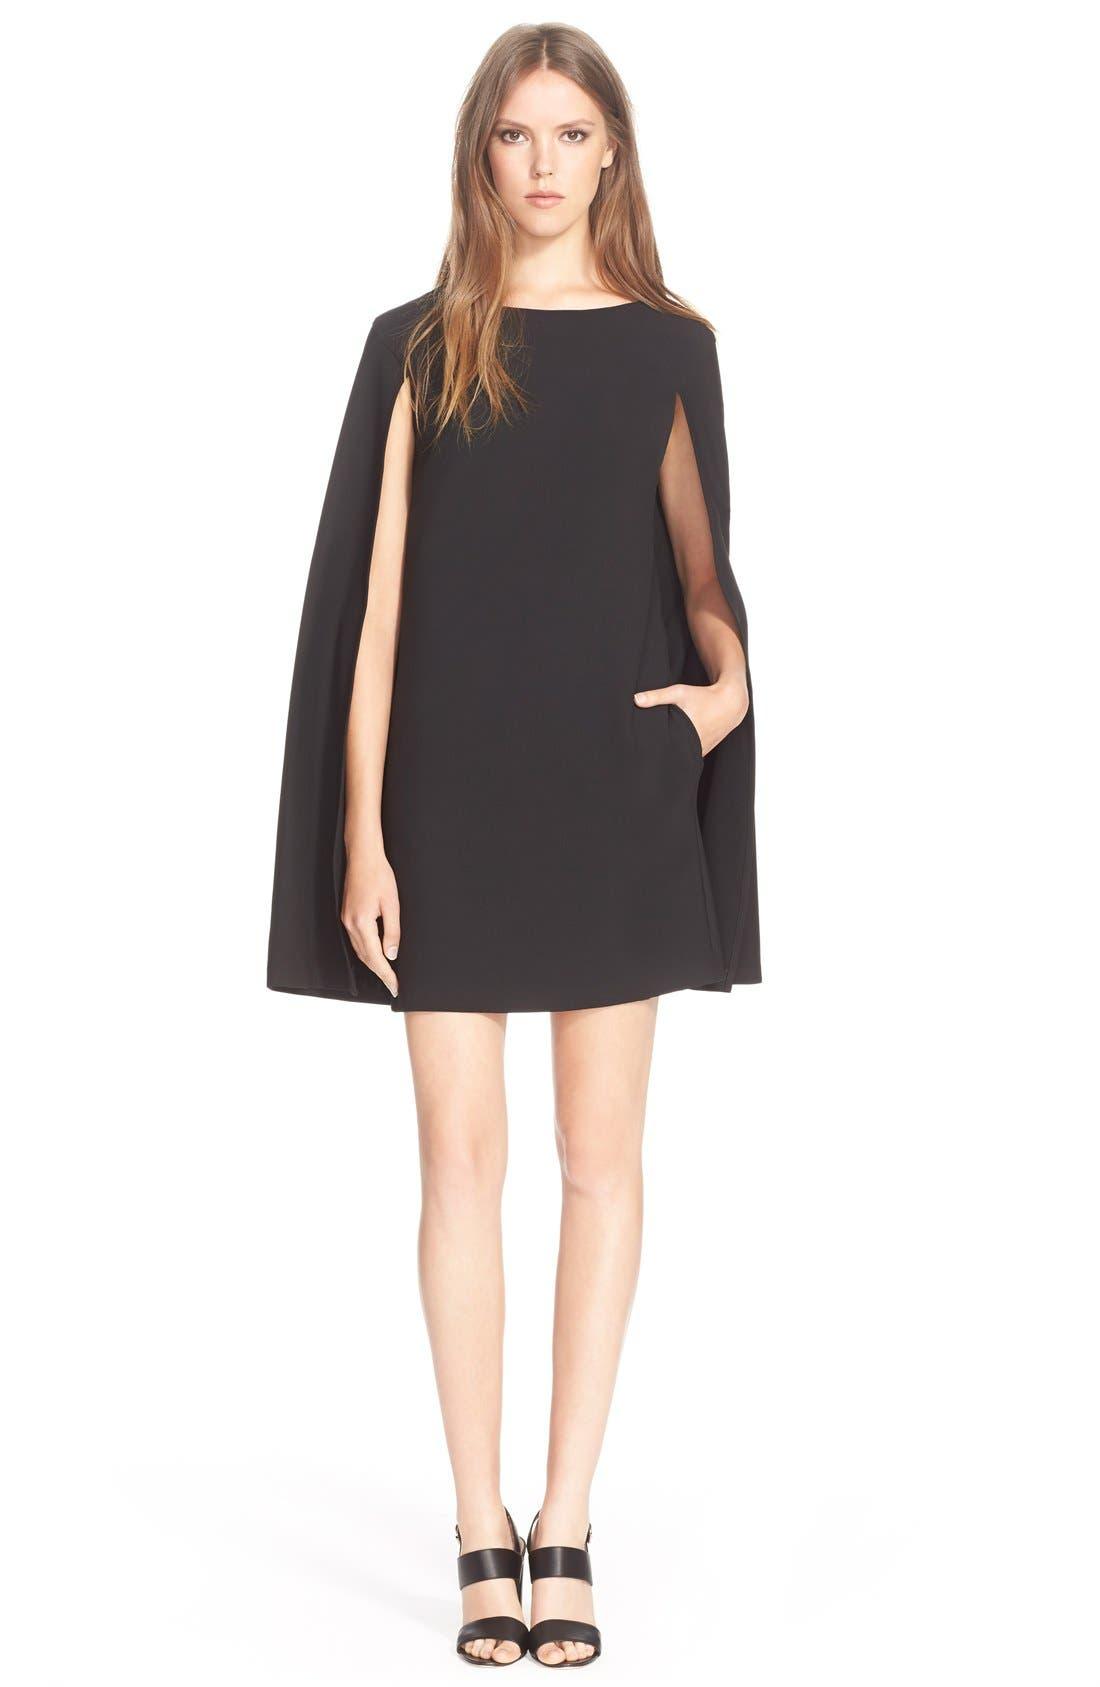 Main Image - TrinaTurk'Gizela'Cape Back Dress